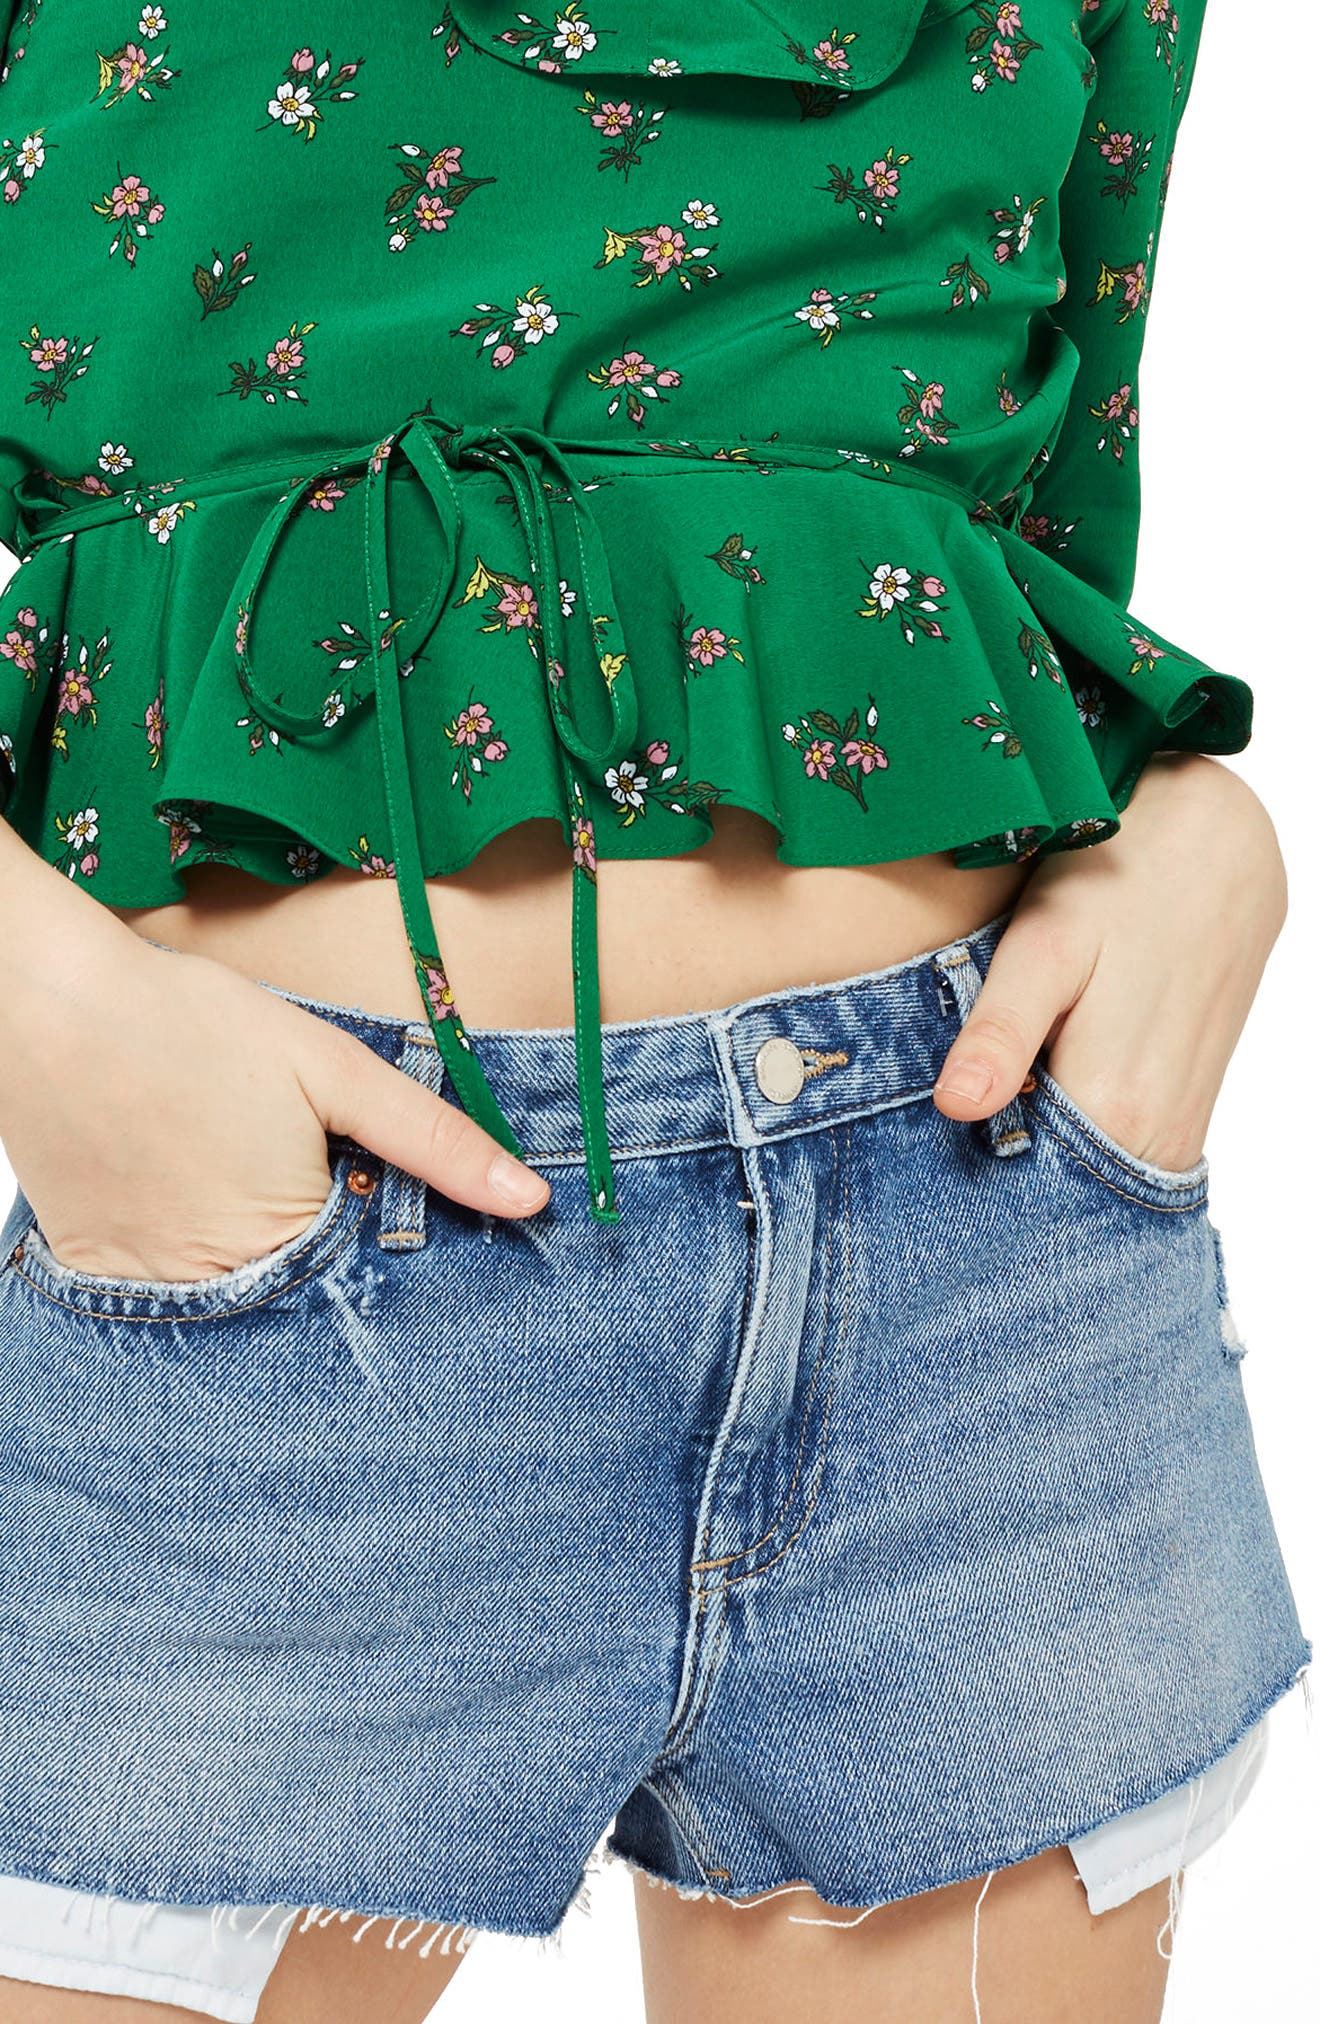 Alternate Image 1 Selected - Topshop Cory Moto Mid Denim Shorts